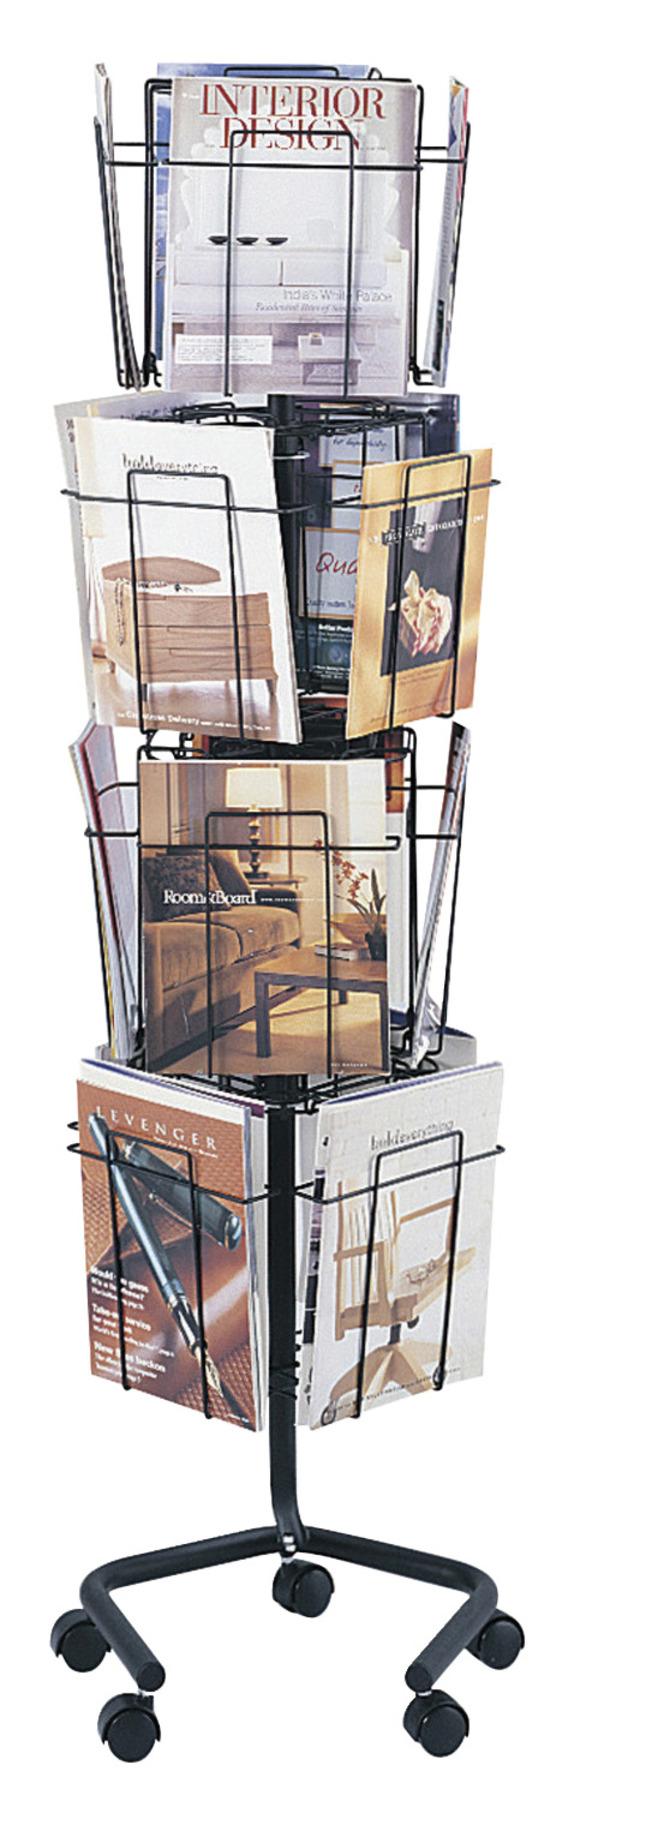 Library Literature Racks Supplies, Item Number 1134762